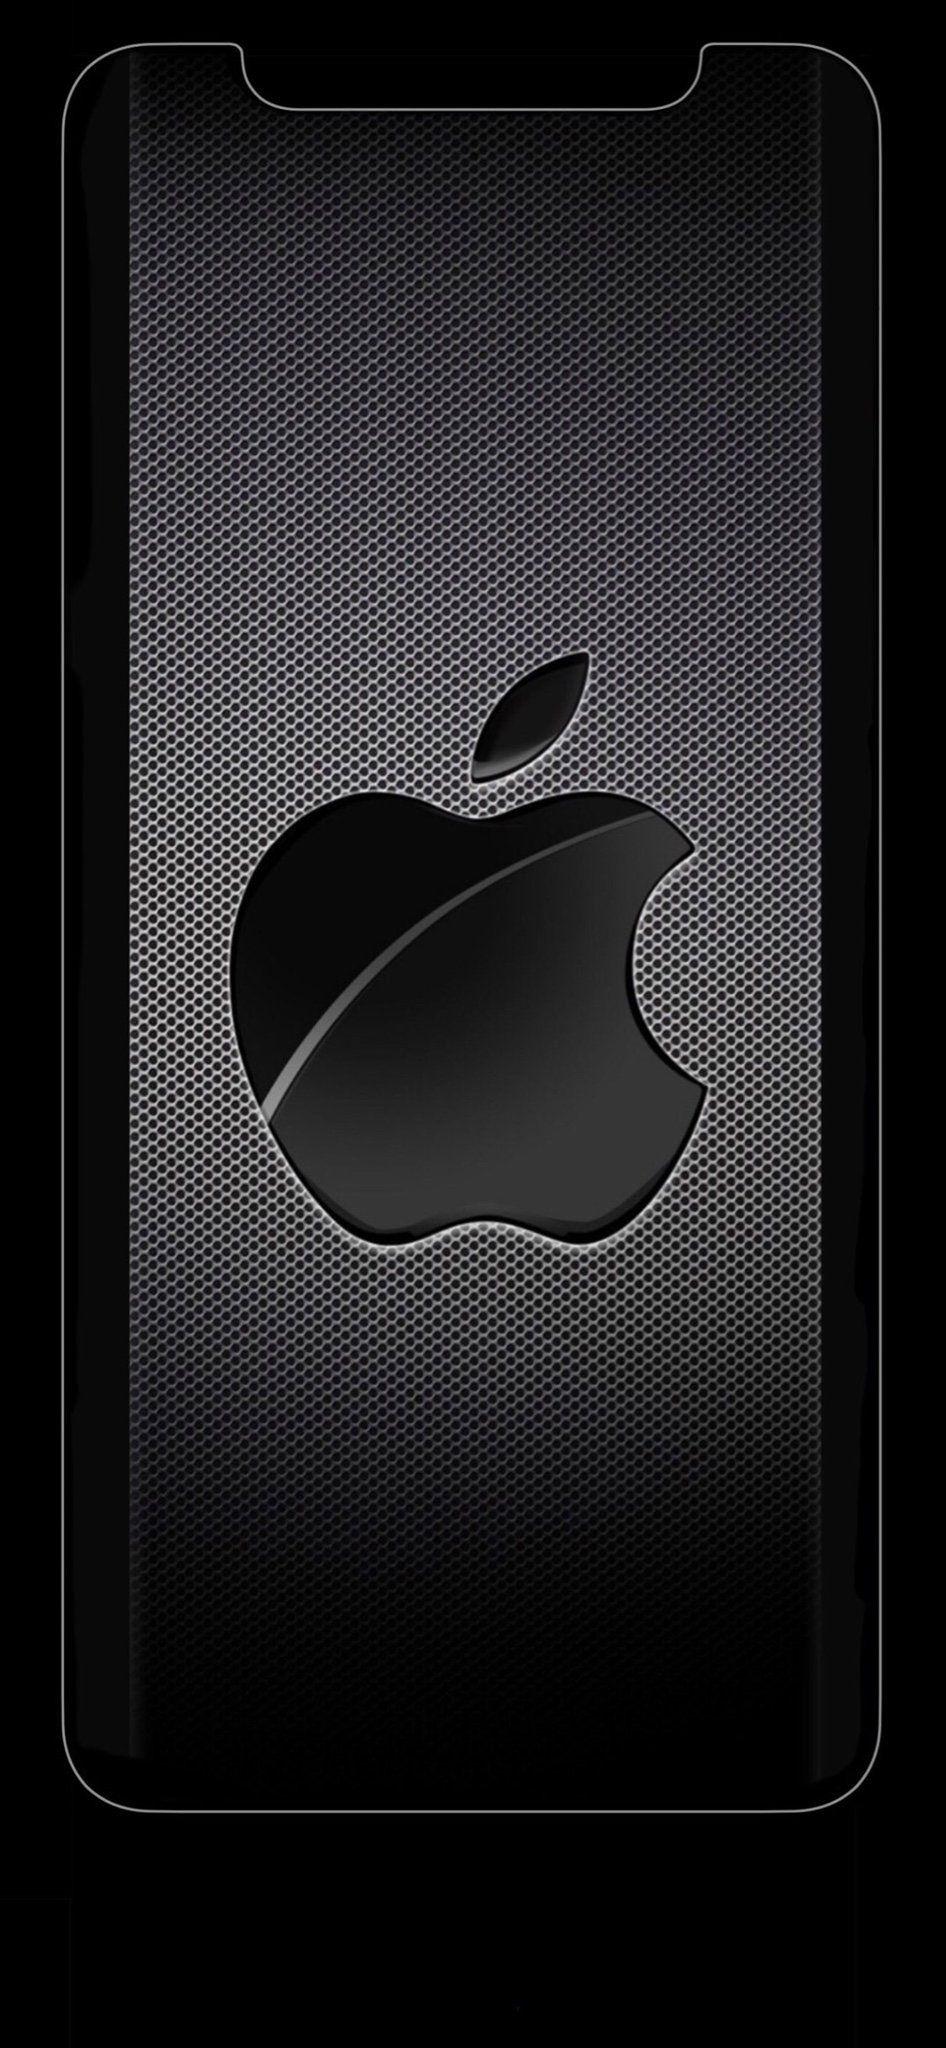 Iphonex Ios11 Ios12 Lockscreen Homescreen Backgrounds Apple Iphone Ipad Ios Wallpap Apple Logo Wallpaper Iphone Apple Wallpaper Apple Logo Wallpaper